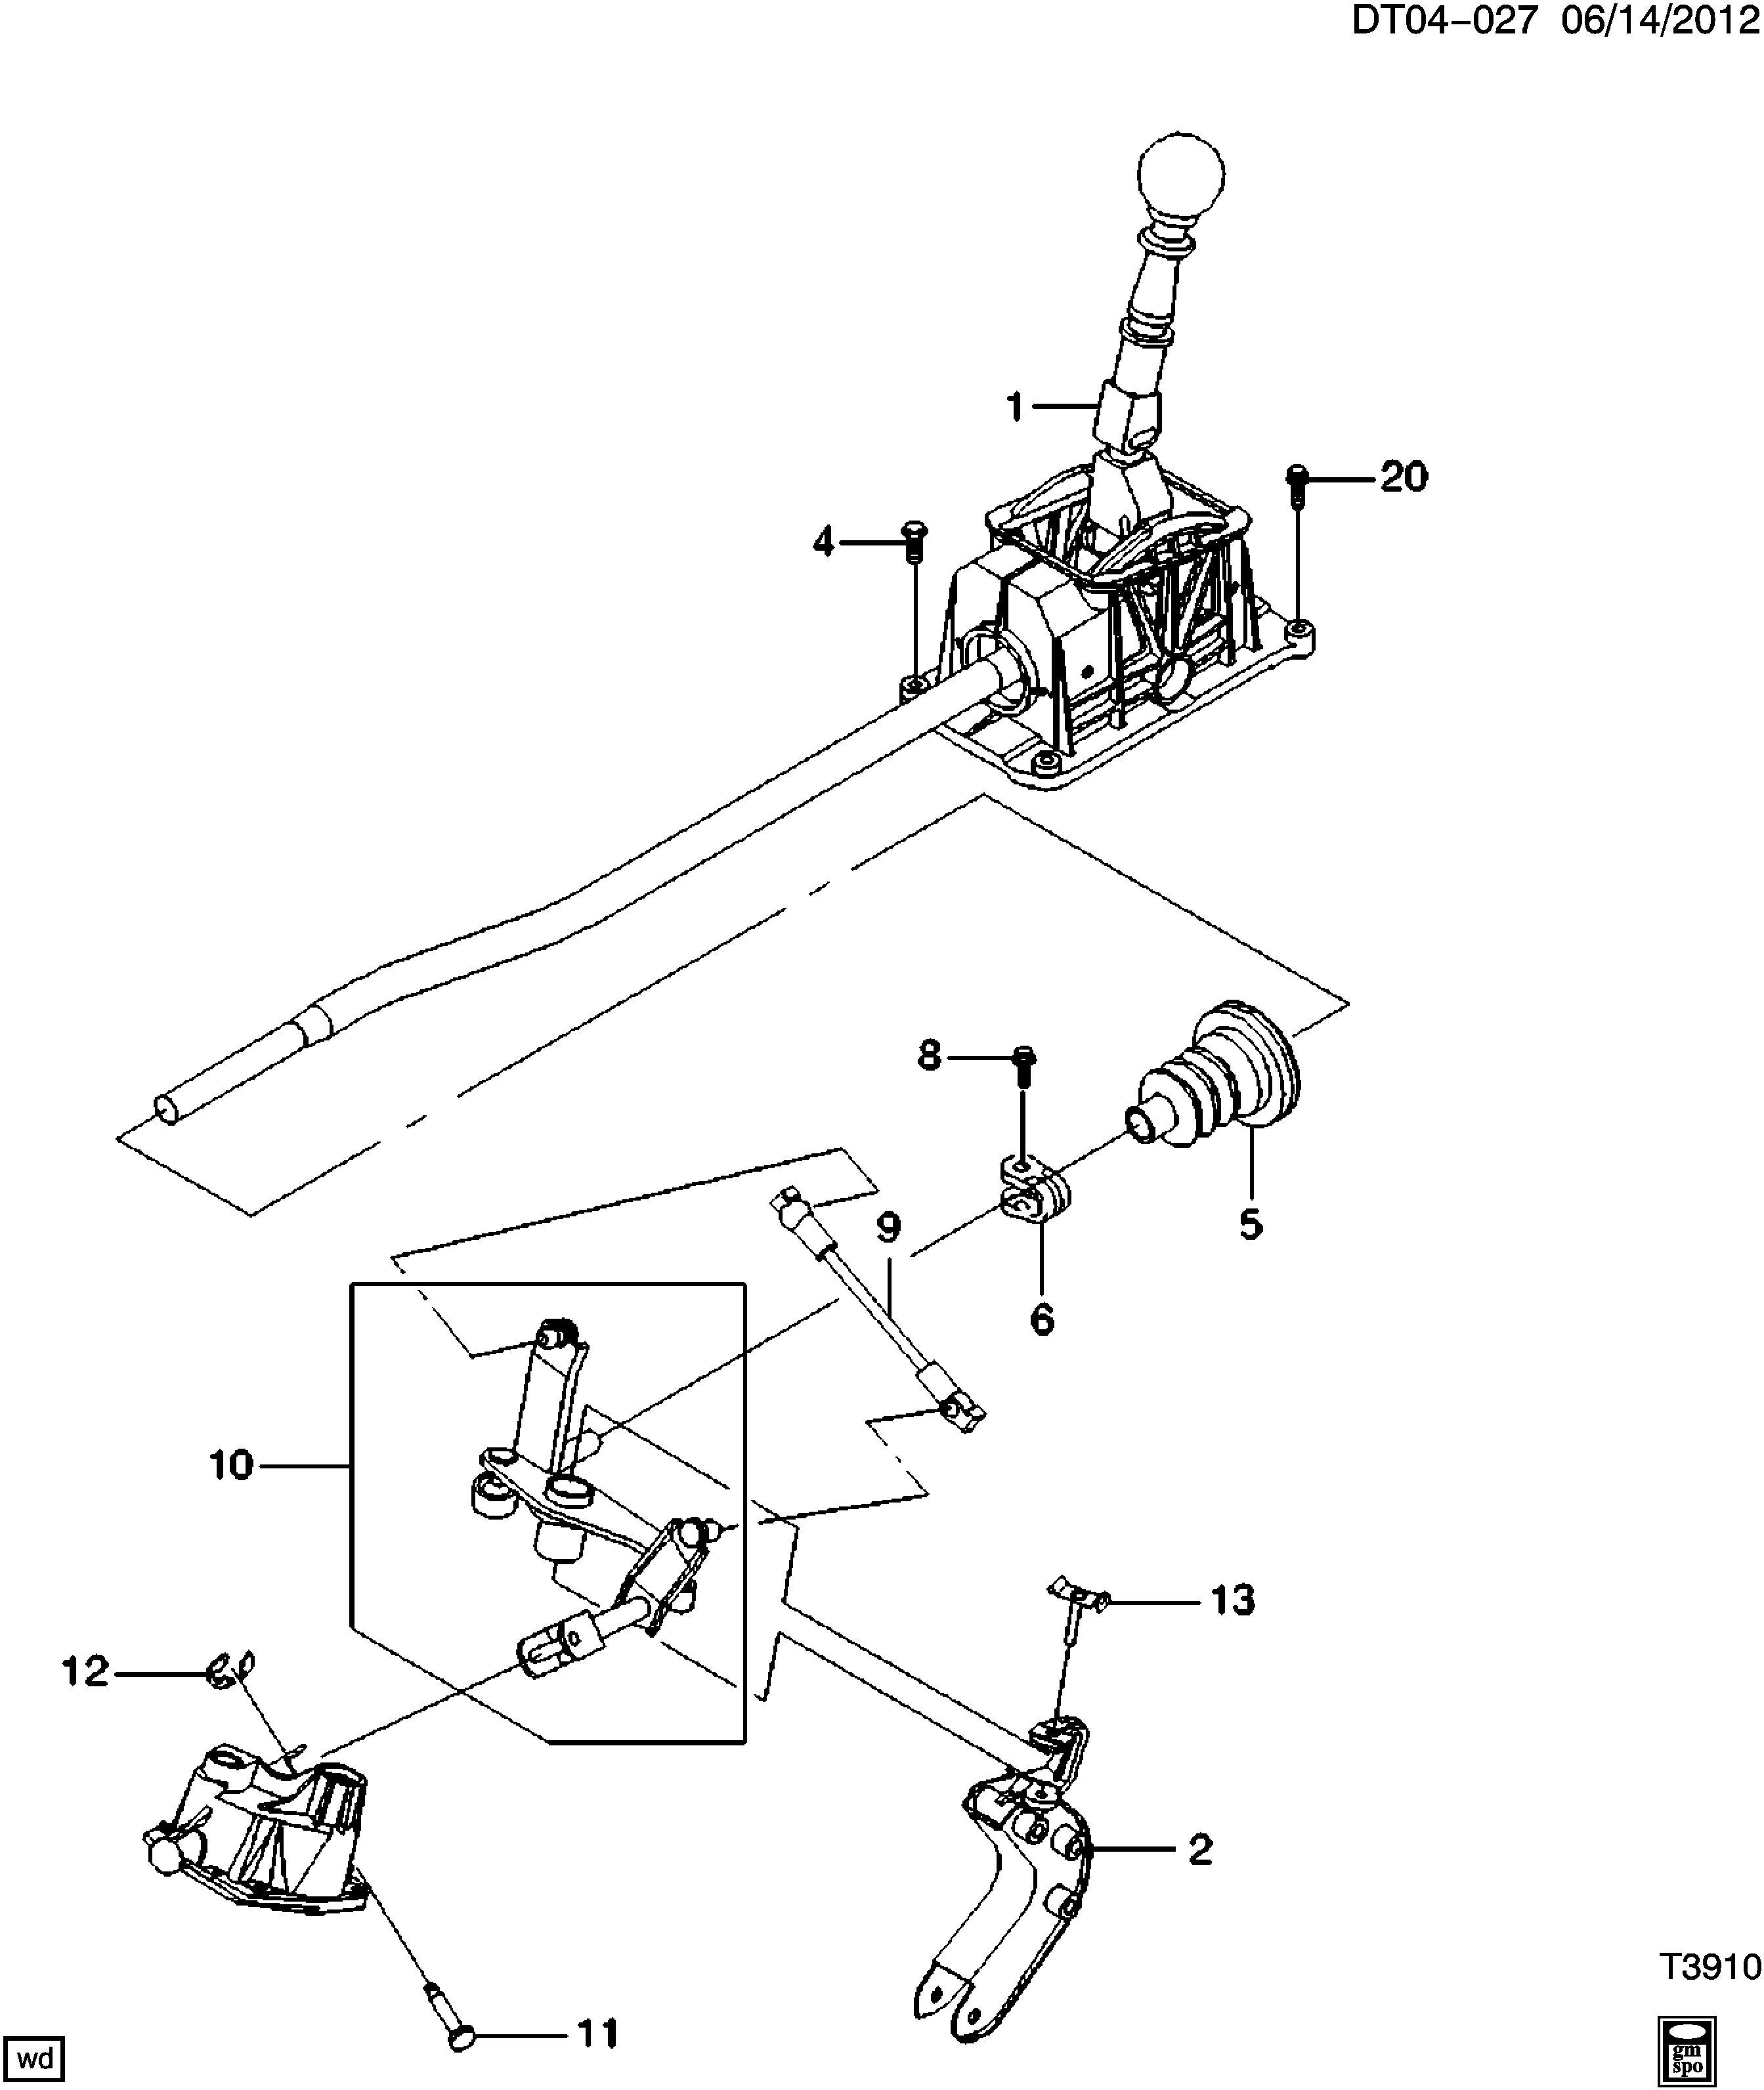 Chevrolet Aveo Lever  Transmission Shift Shaft Lever Rod  Rod  Transmission Shift Shaft